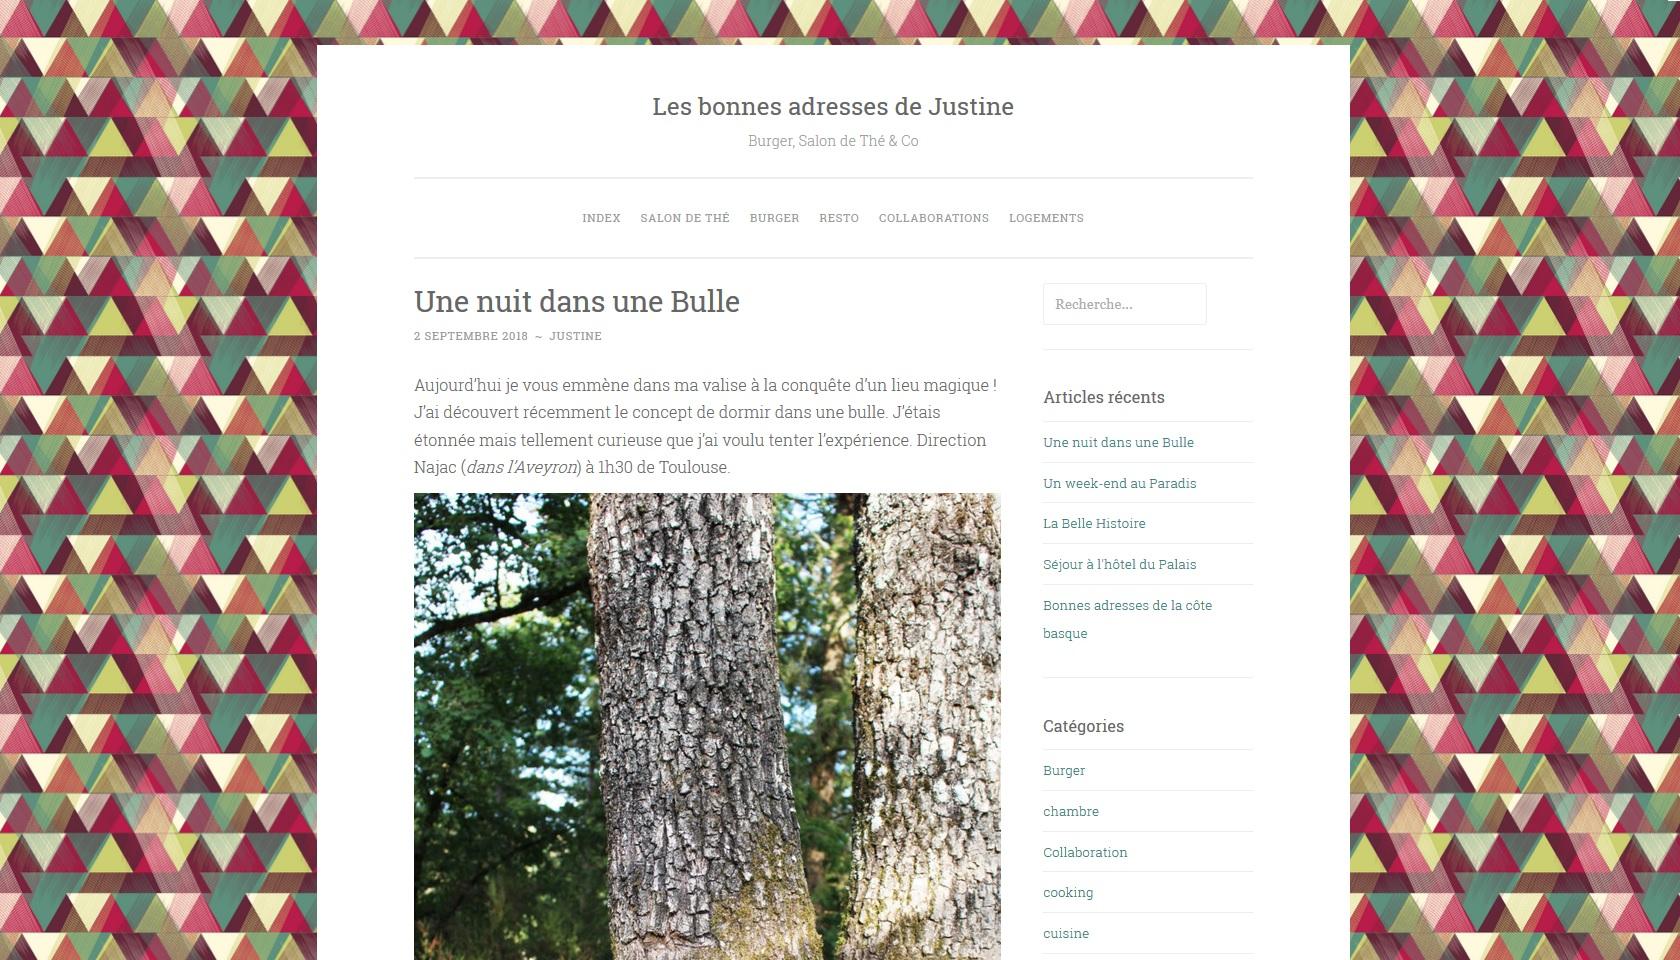 https://www.somnenbulle.fr/wp-content/uploads/2018/09/somnenbulle-presse-lesbonnesadressesdejustine.jpg